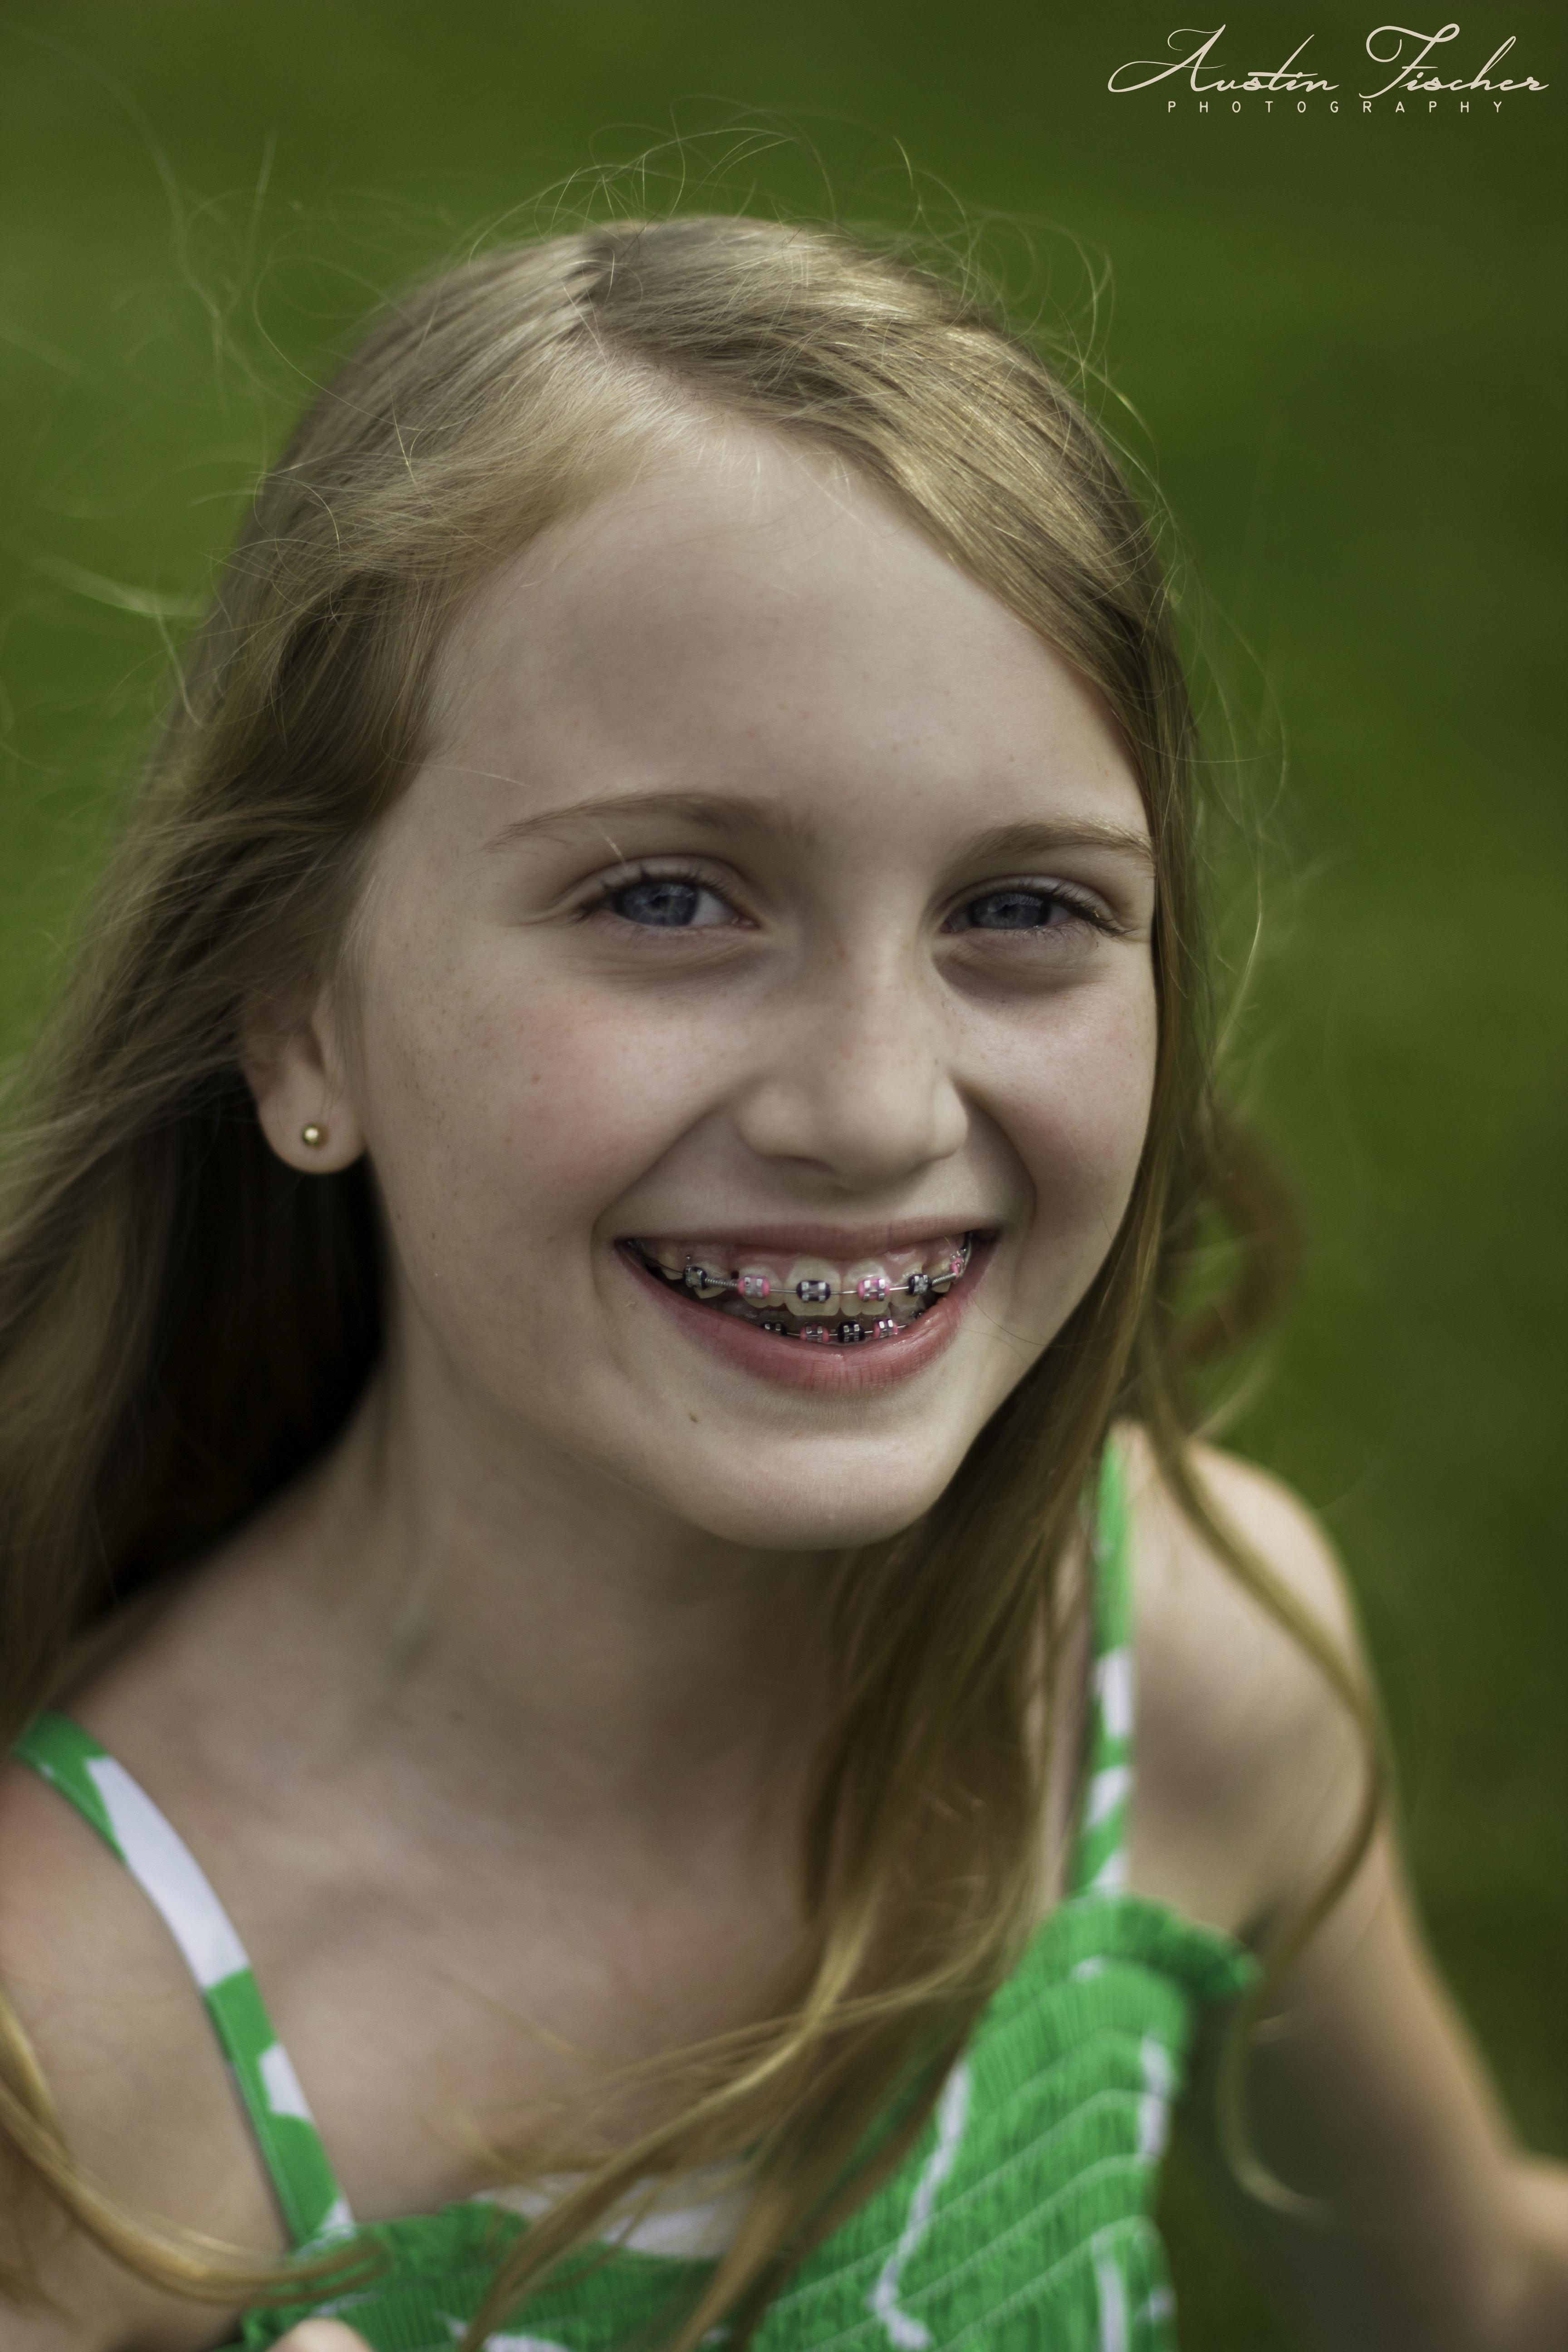 Talia Portrait